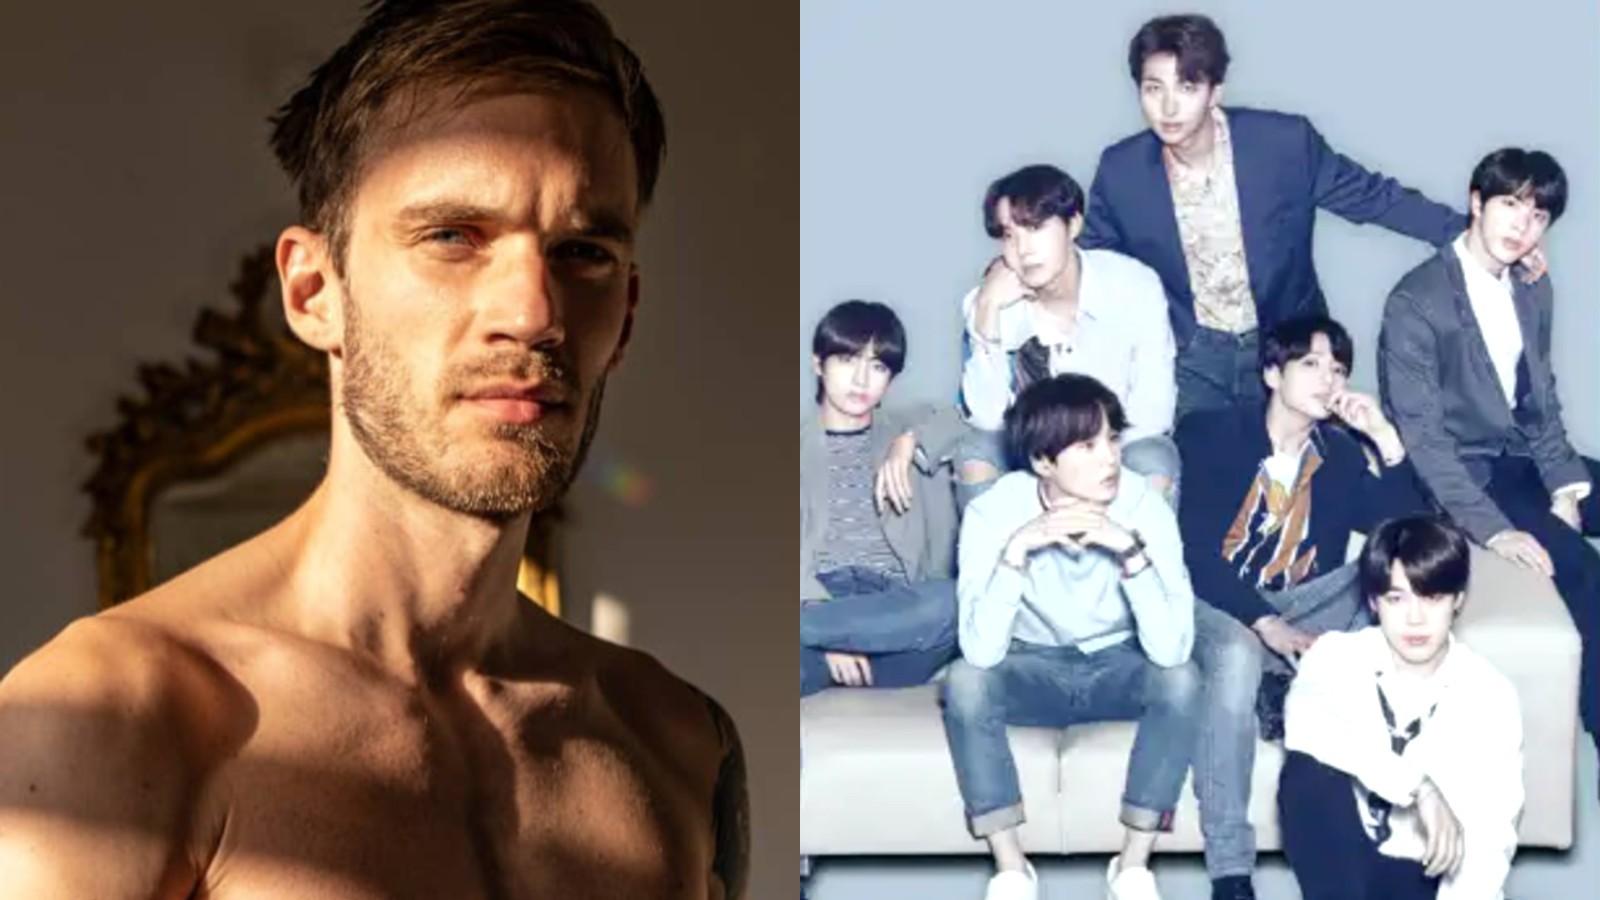 Image of Pewdiepie next to image of BTS